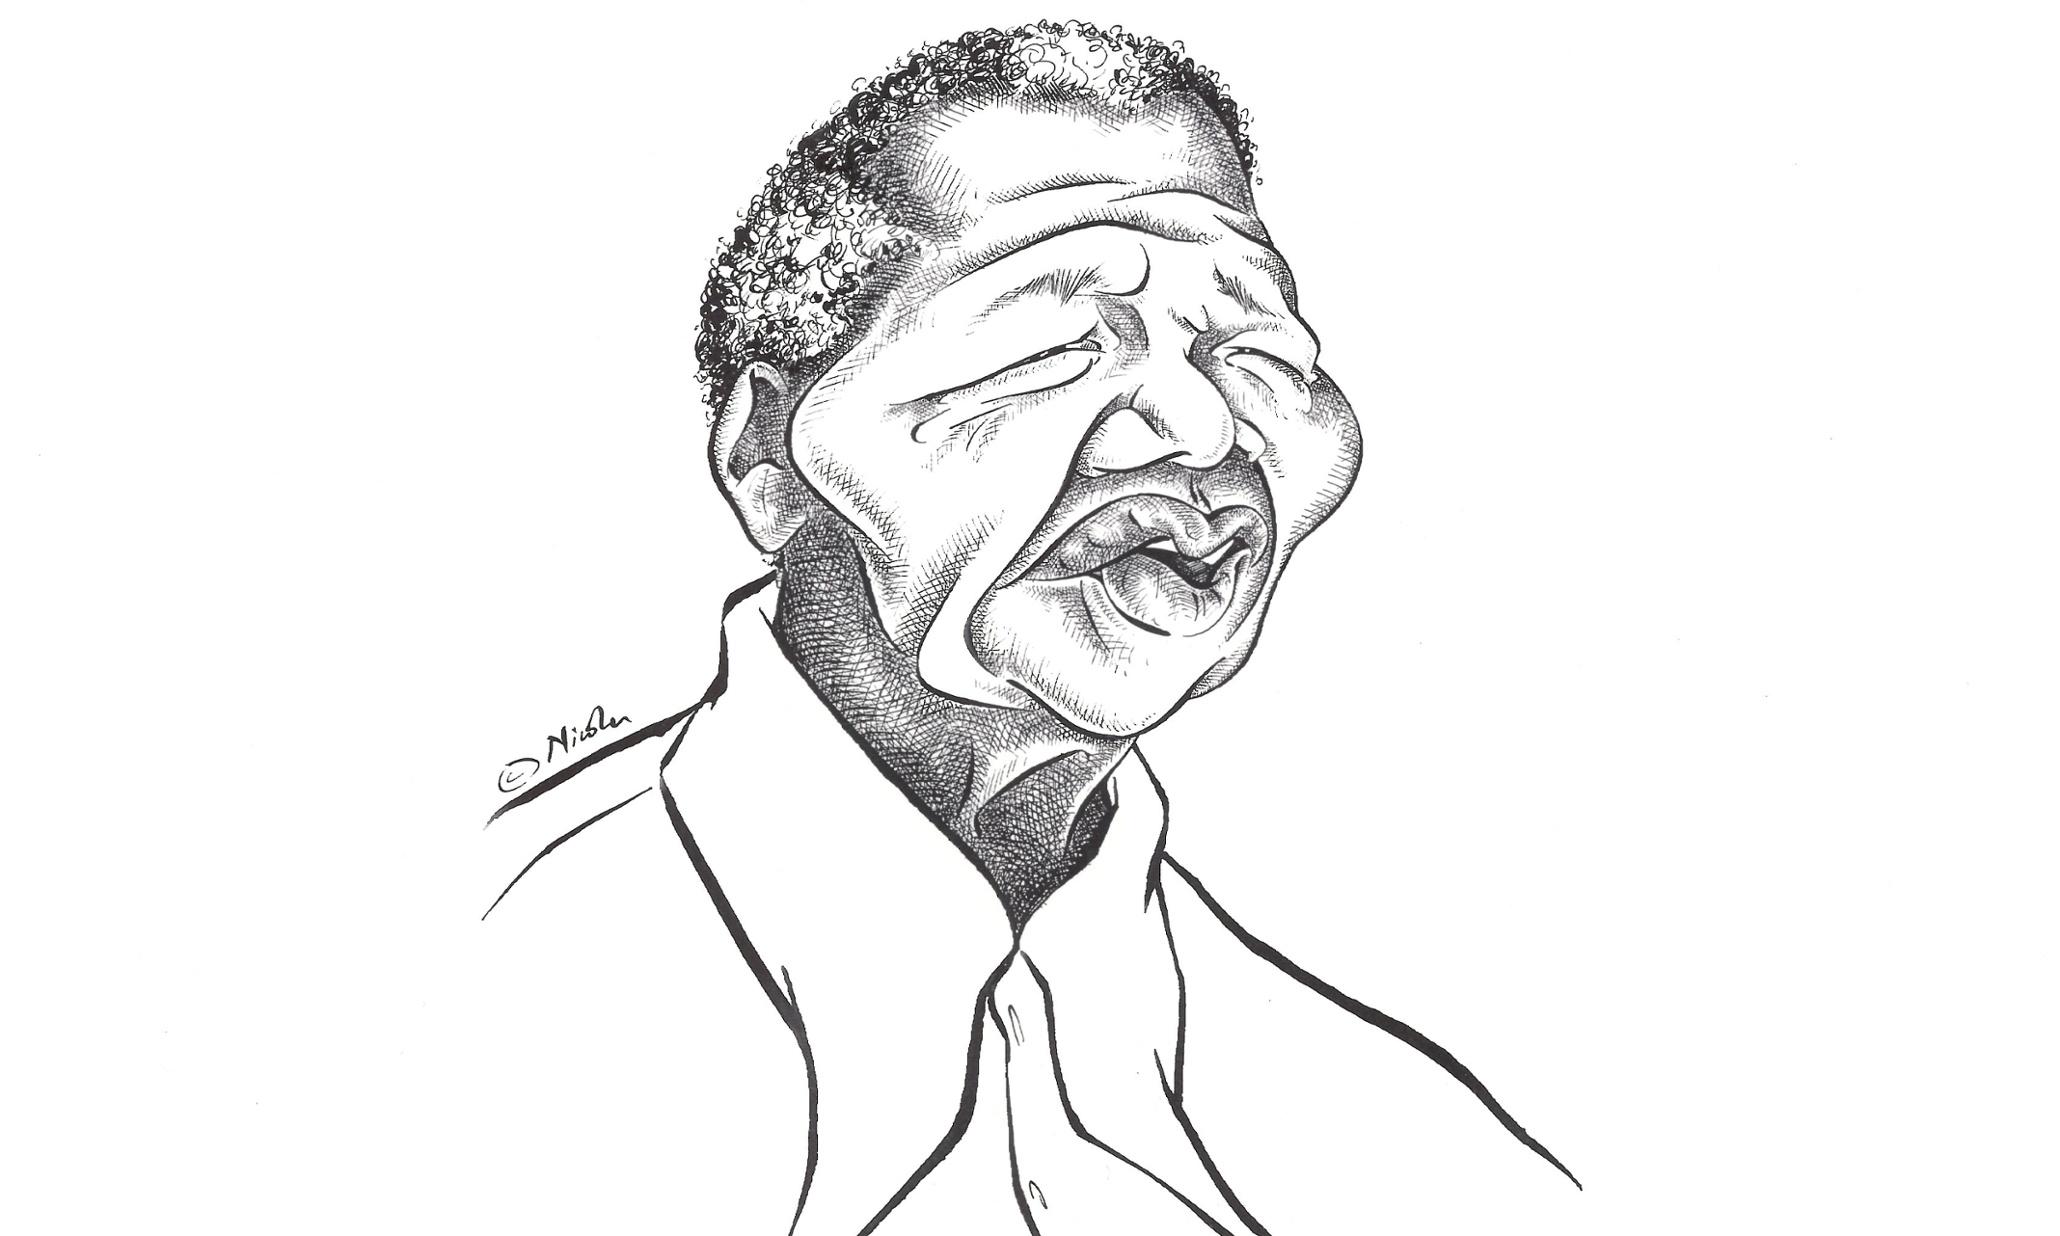 Nicola Jennings, caricaturist: teaching resource from the